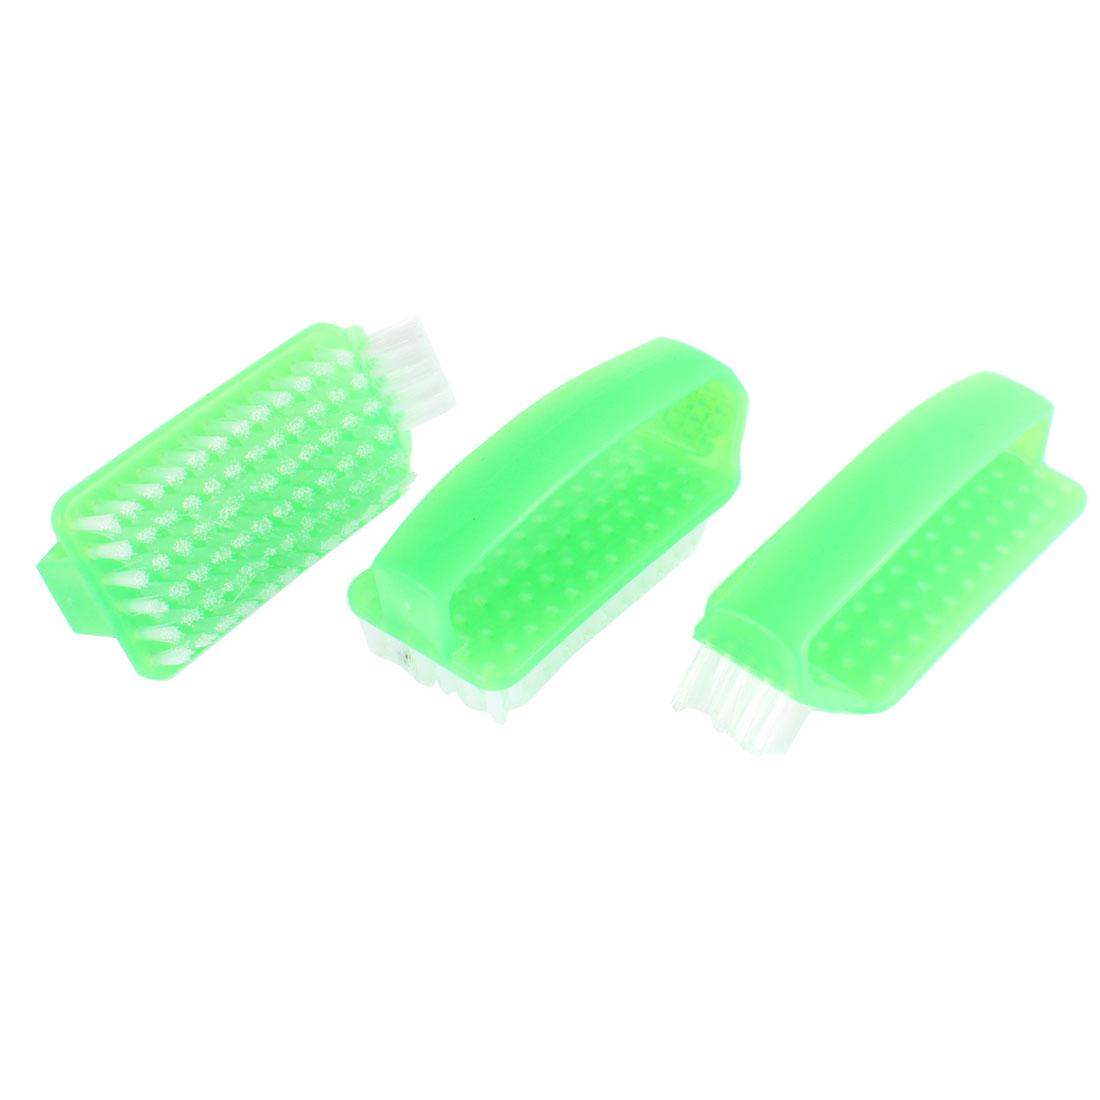 Plastic Grip Clothes Shoes Scrubbing Brush Green 3Pcs